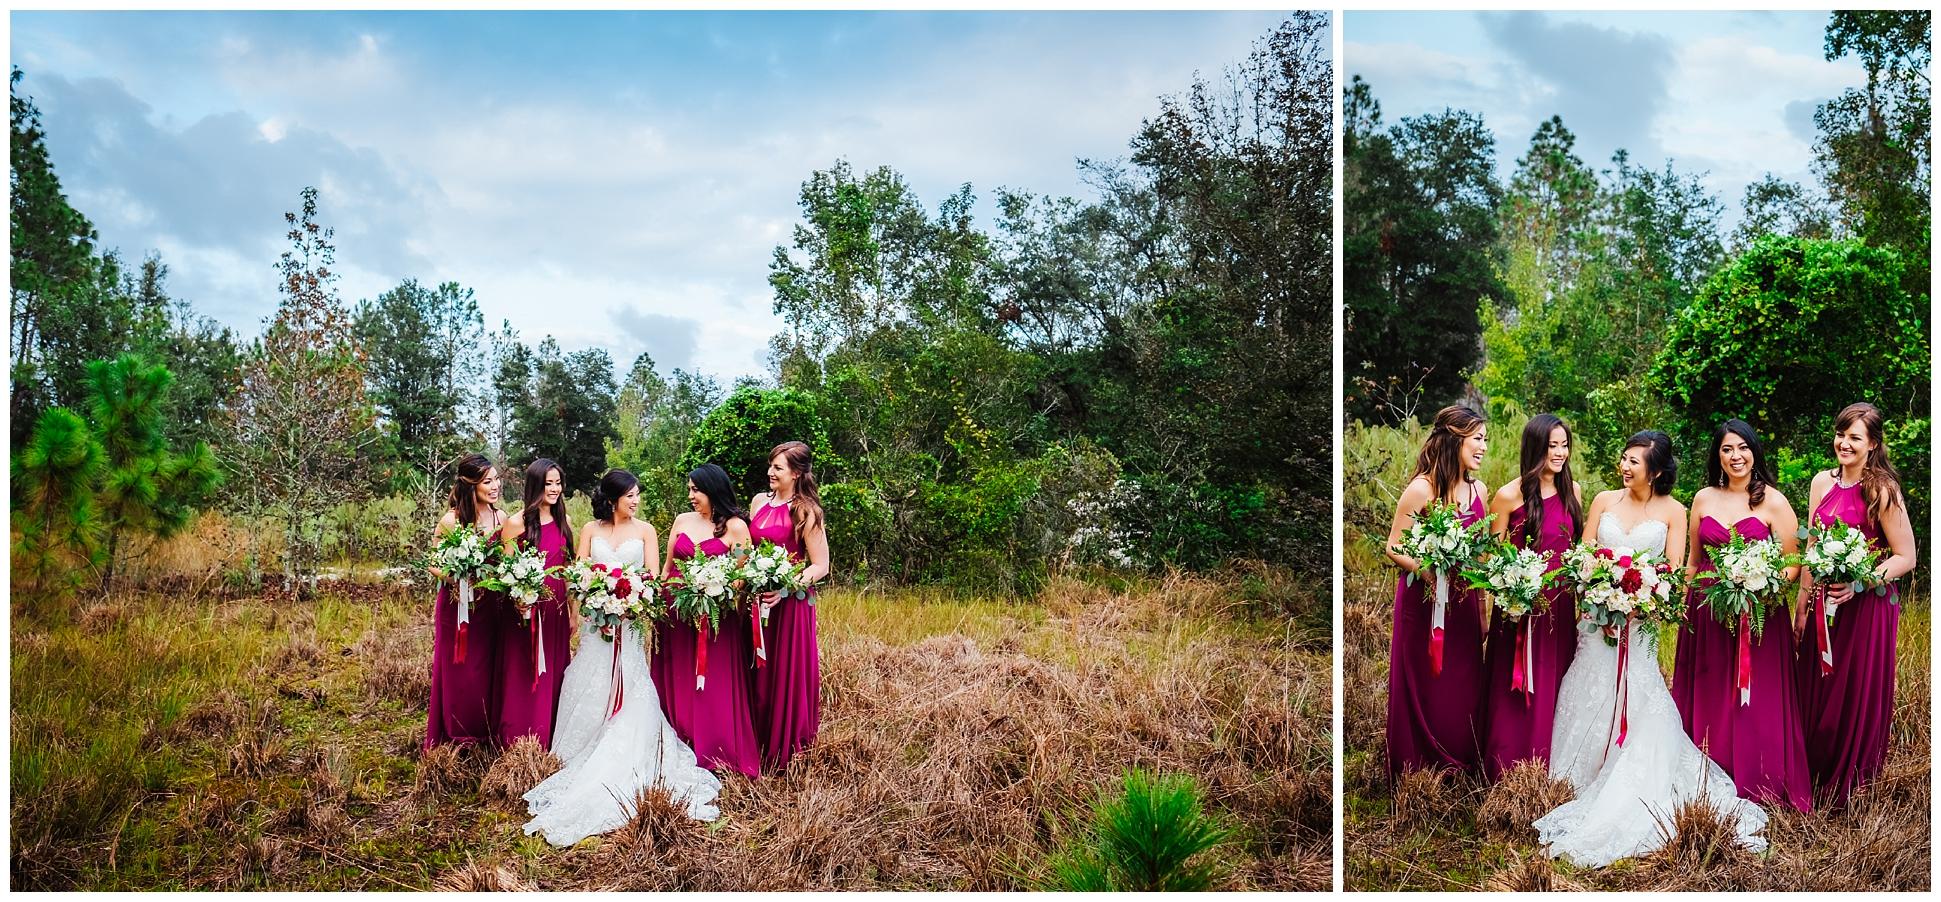 tampa-wedding-photographer-philipino-colorful-woods-ballroom-church-mass-confetti-fuscia_0047.jpg